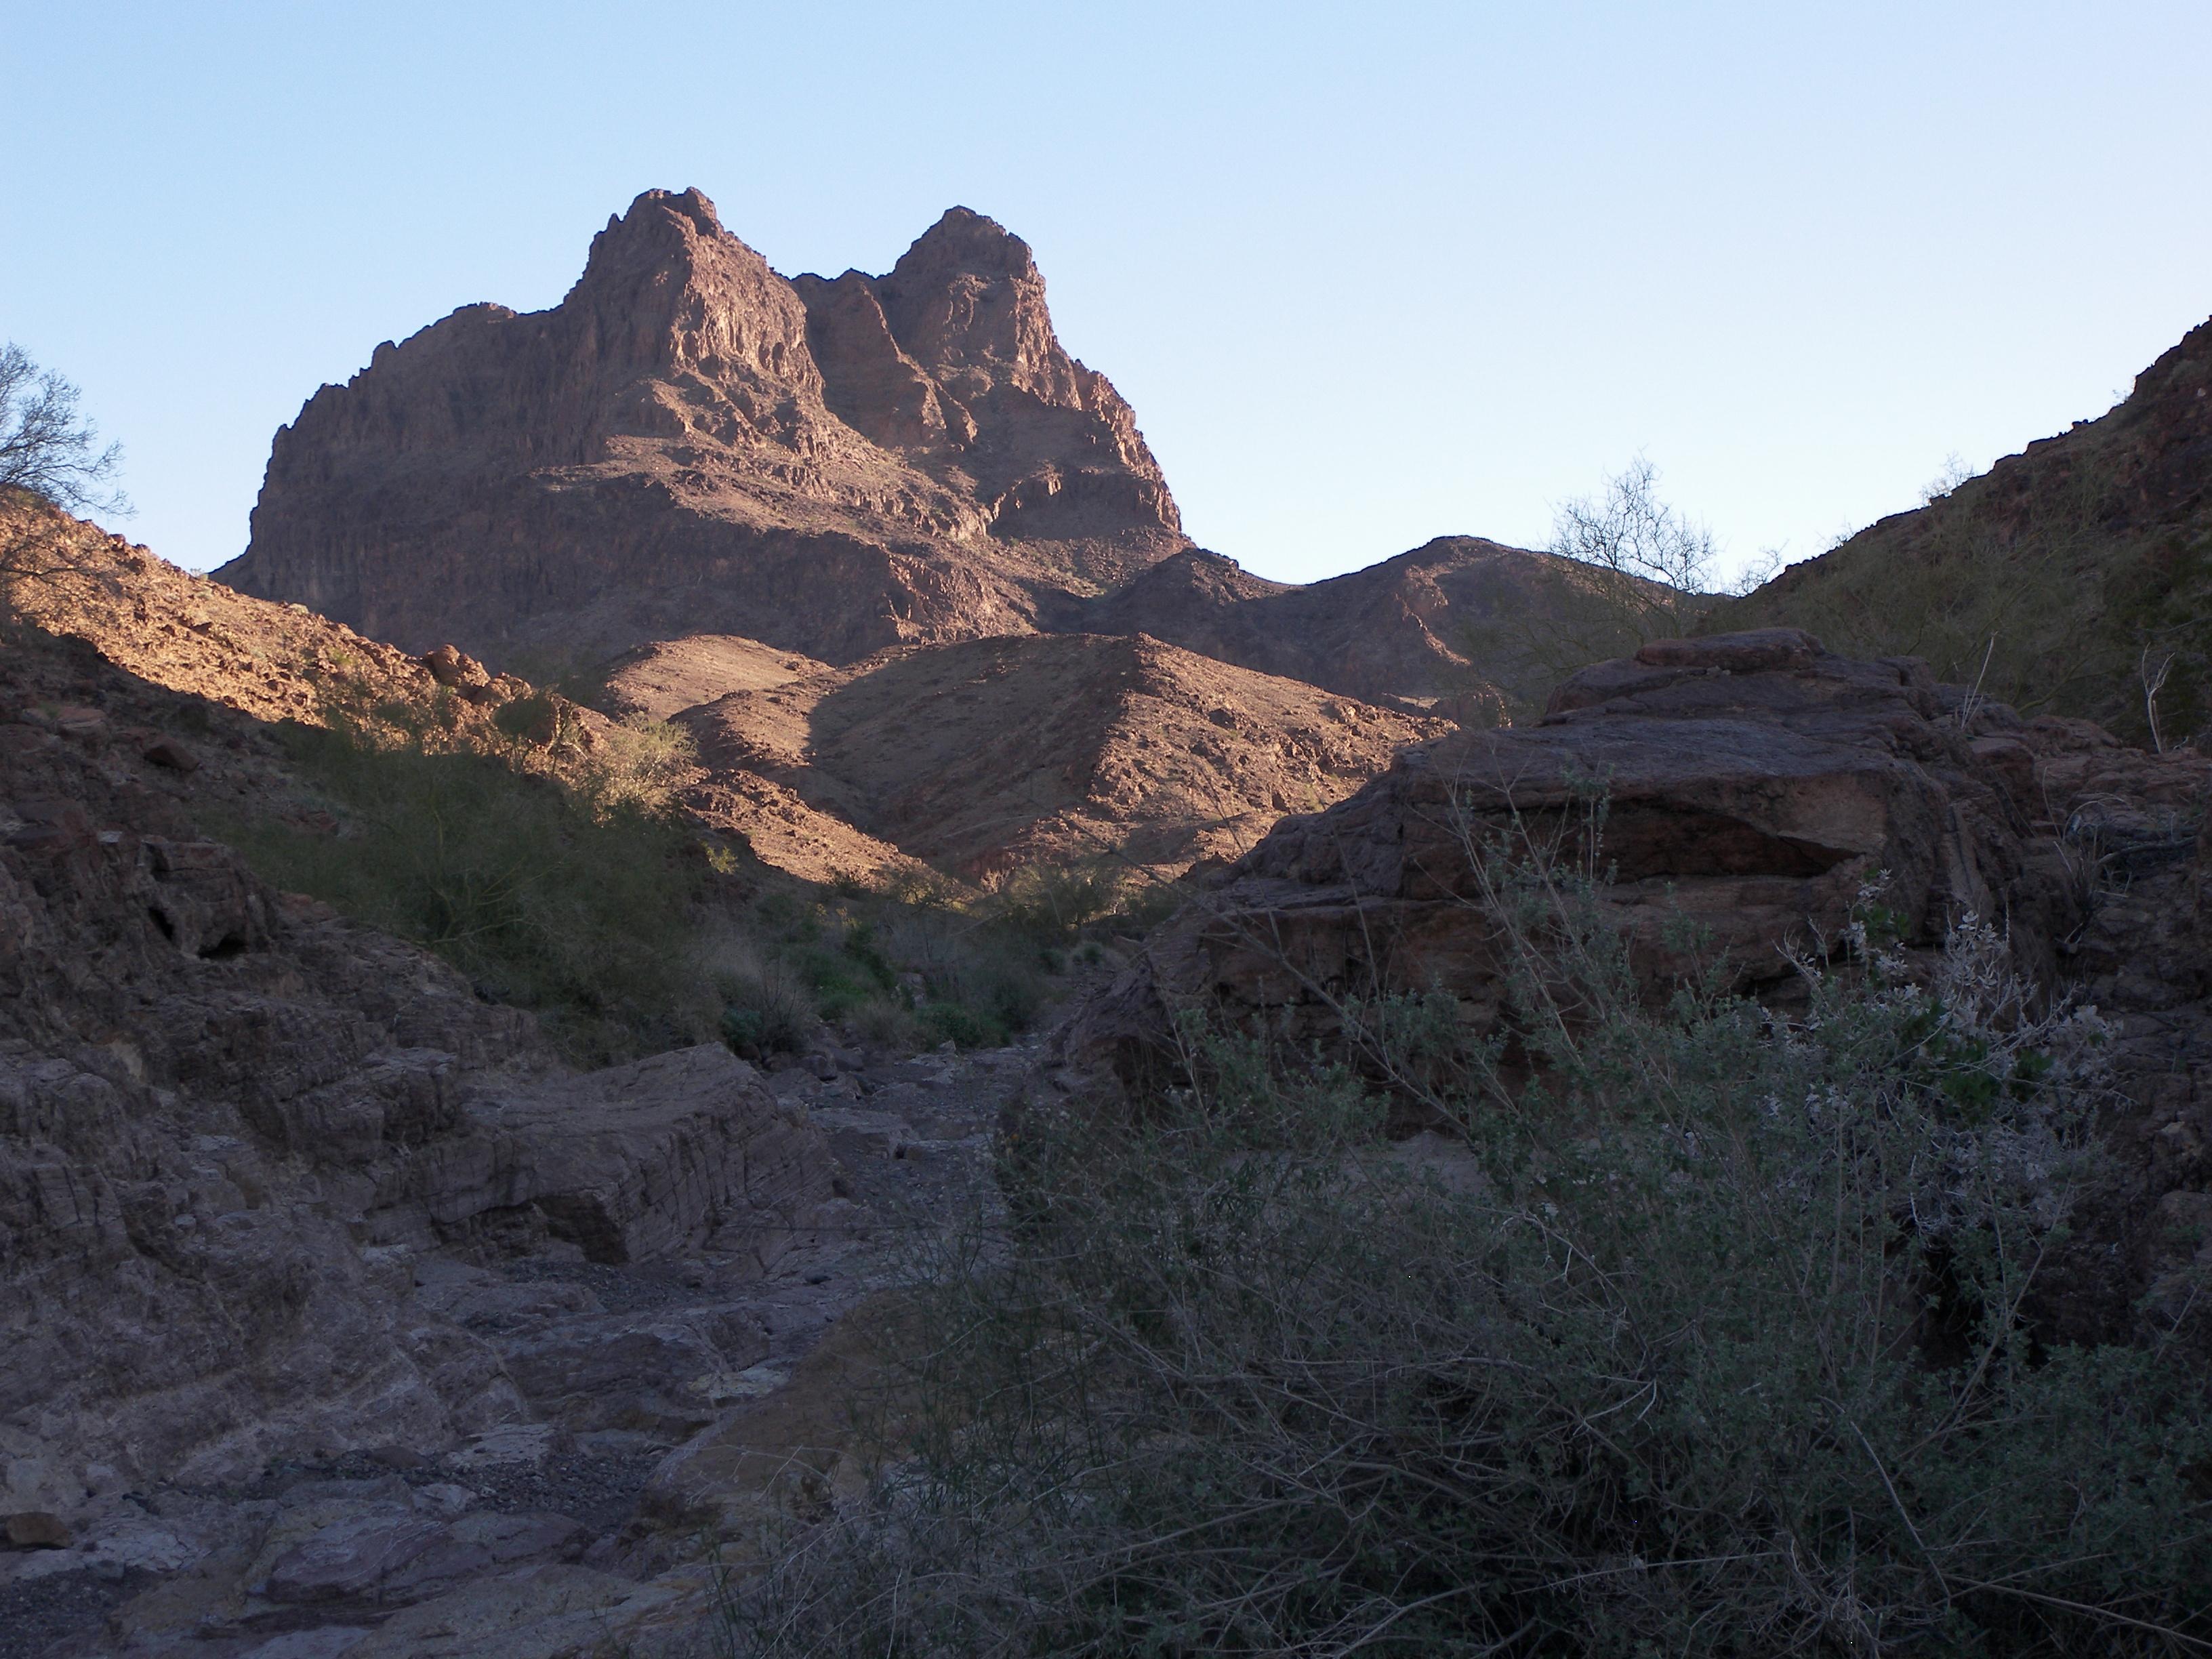 Muggins mountains wilderness photo